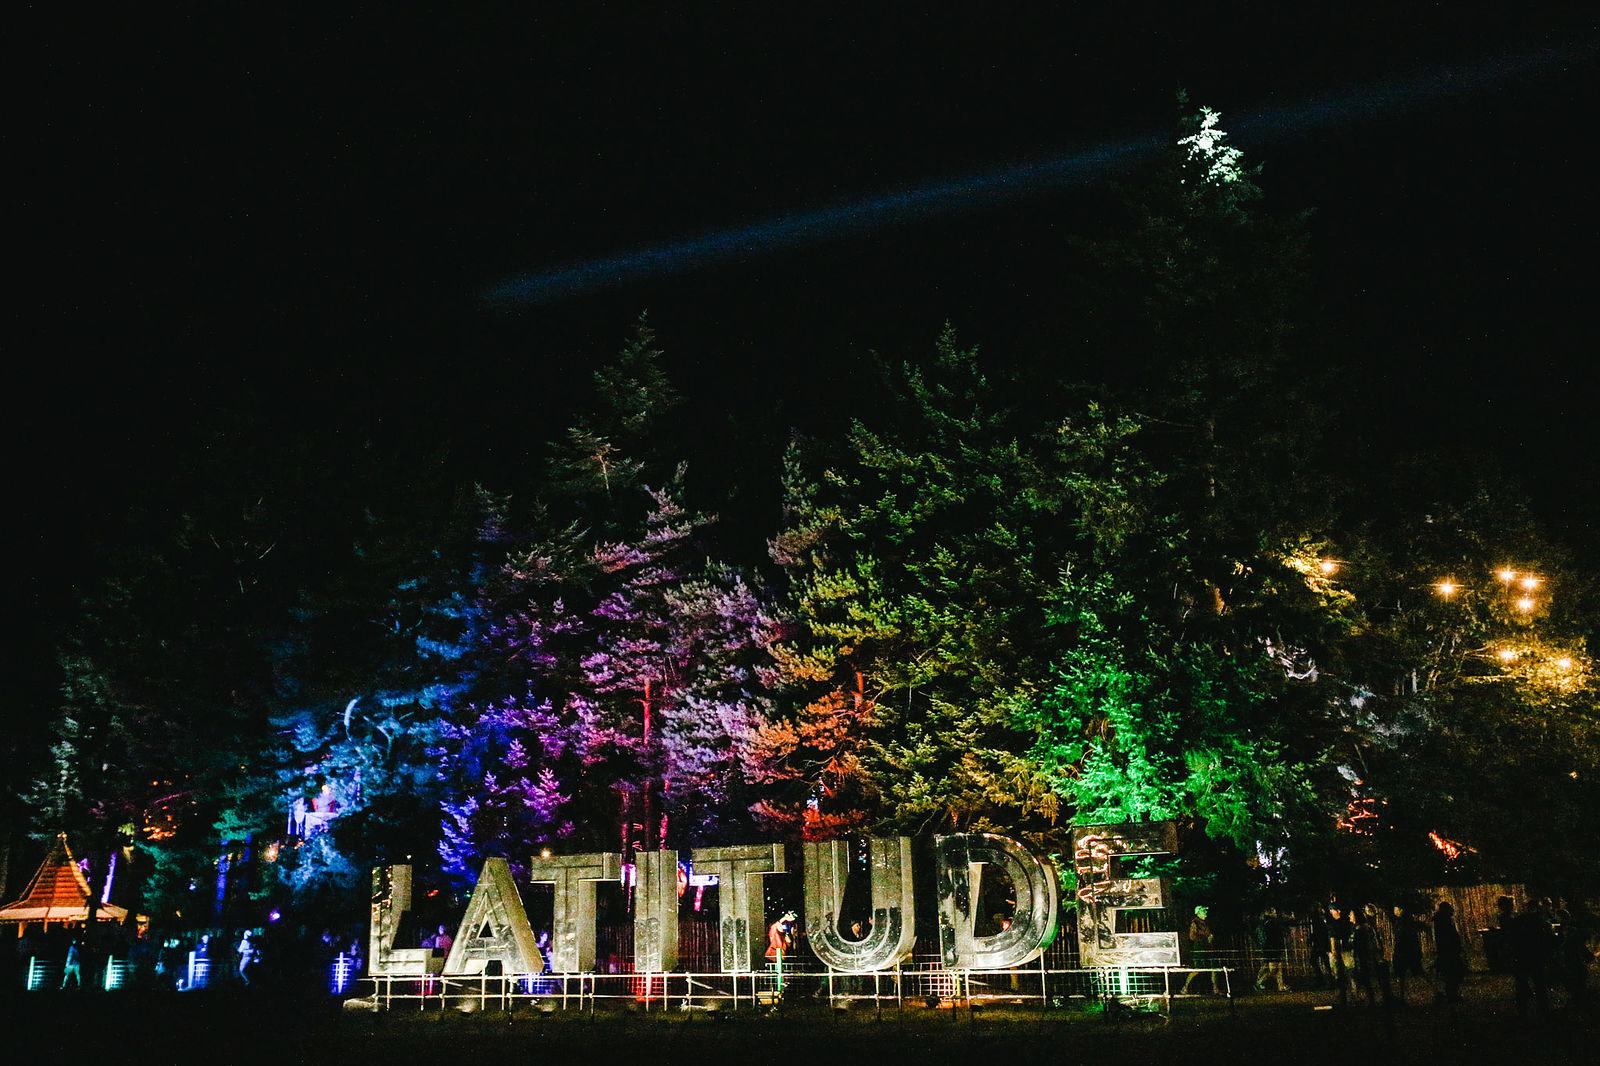 Latitude -entrance